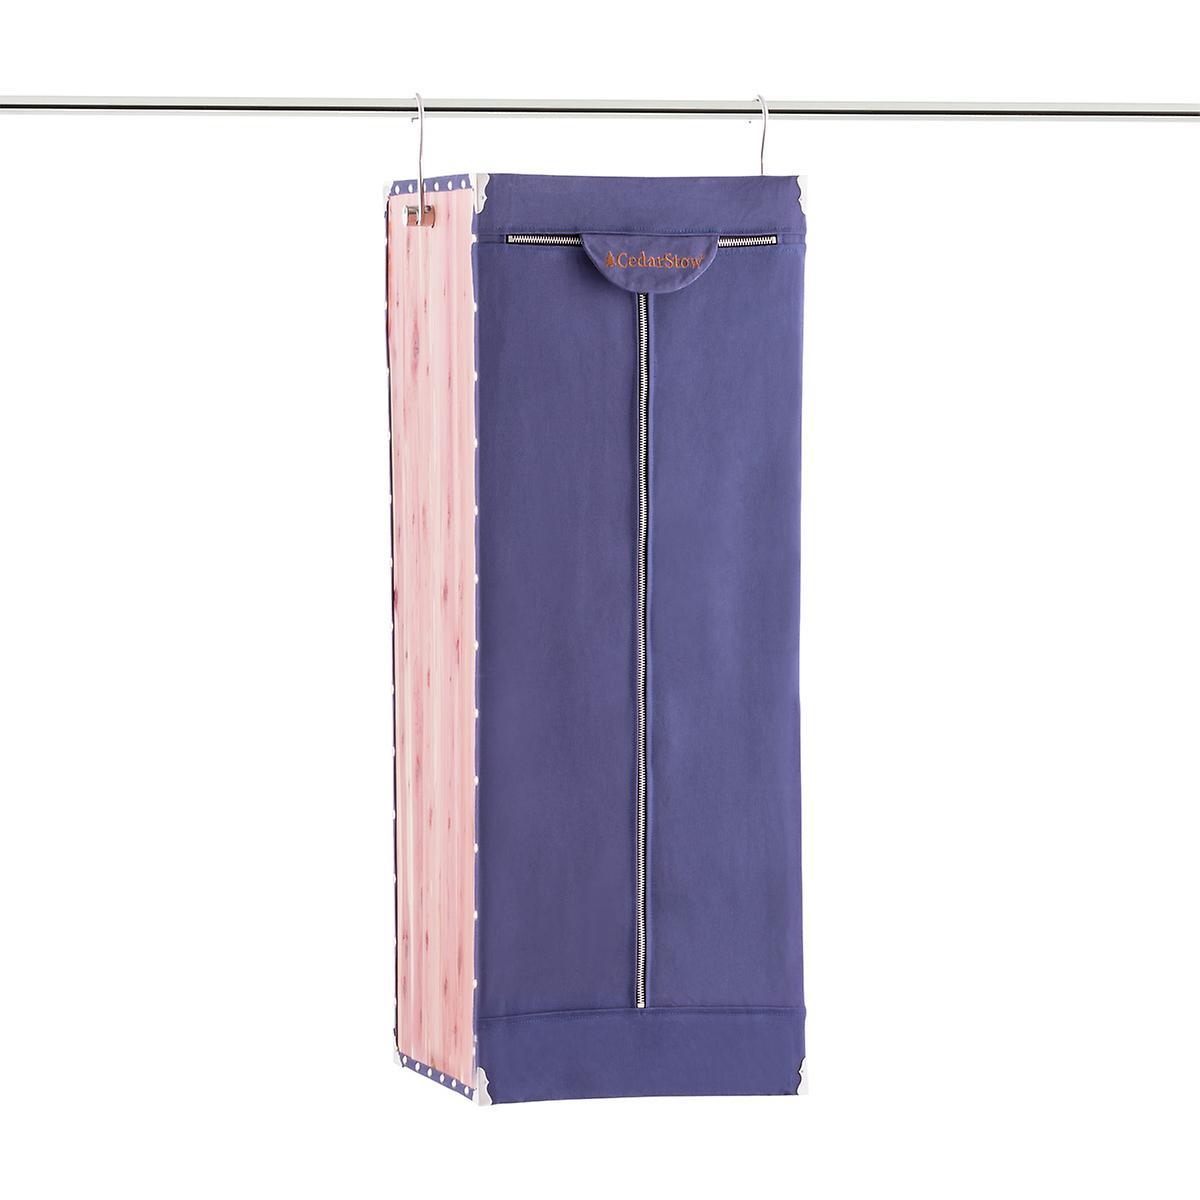 Cedar Stow Hanging Garment Bags